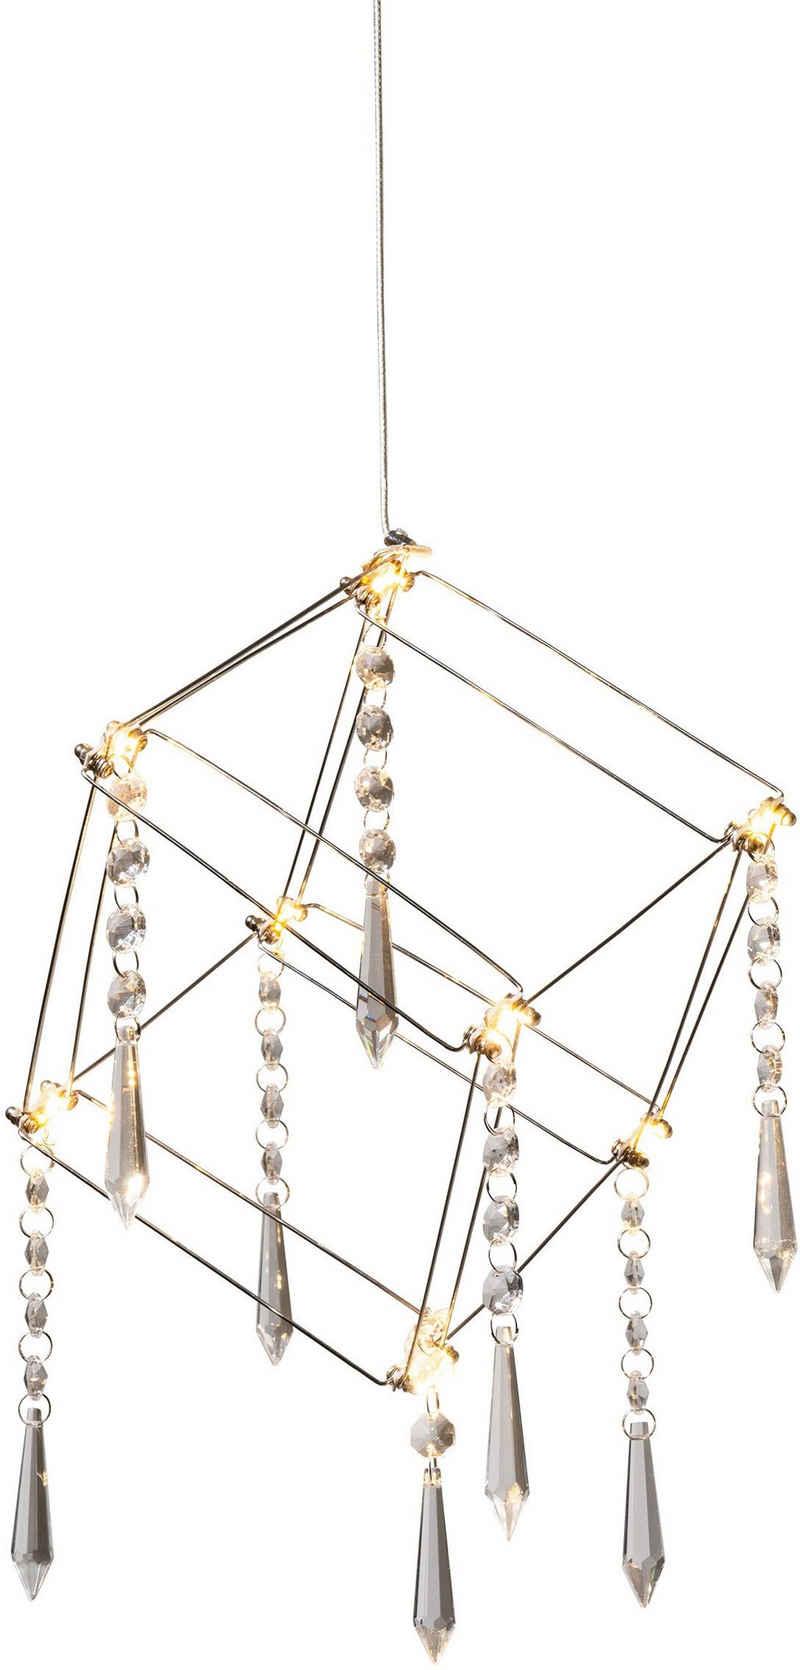 näve LED Pendelleuchte »Araneus«, LED Hängelampe, LED Hängeleuchte